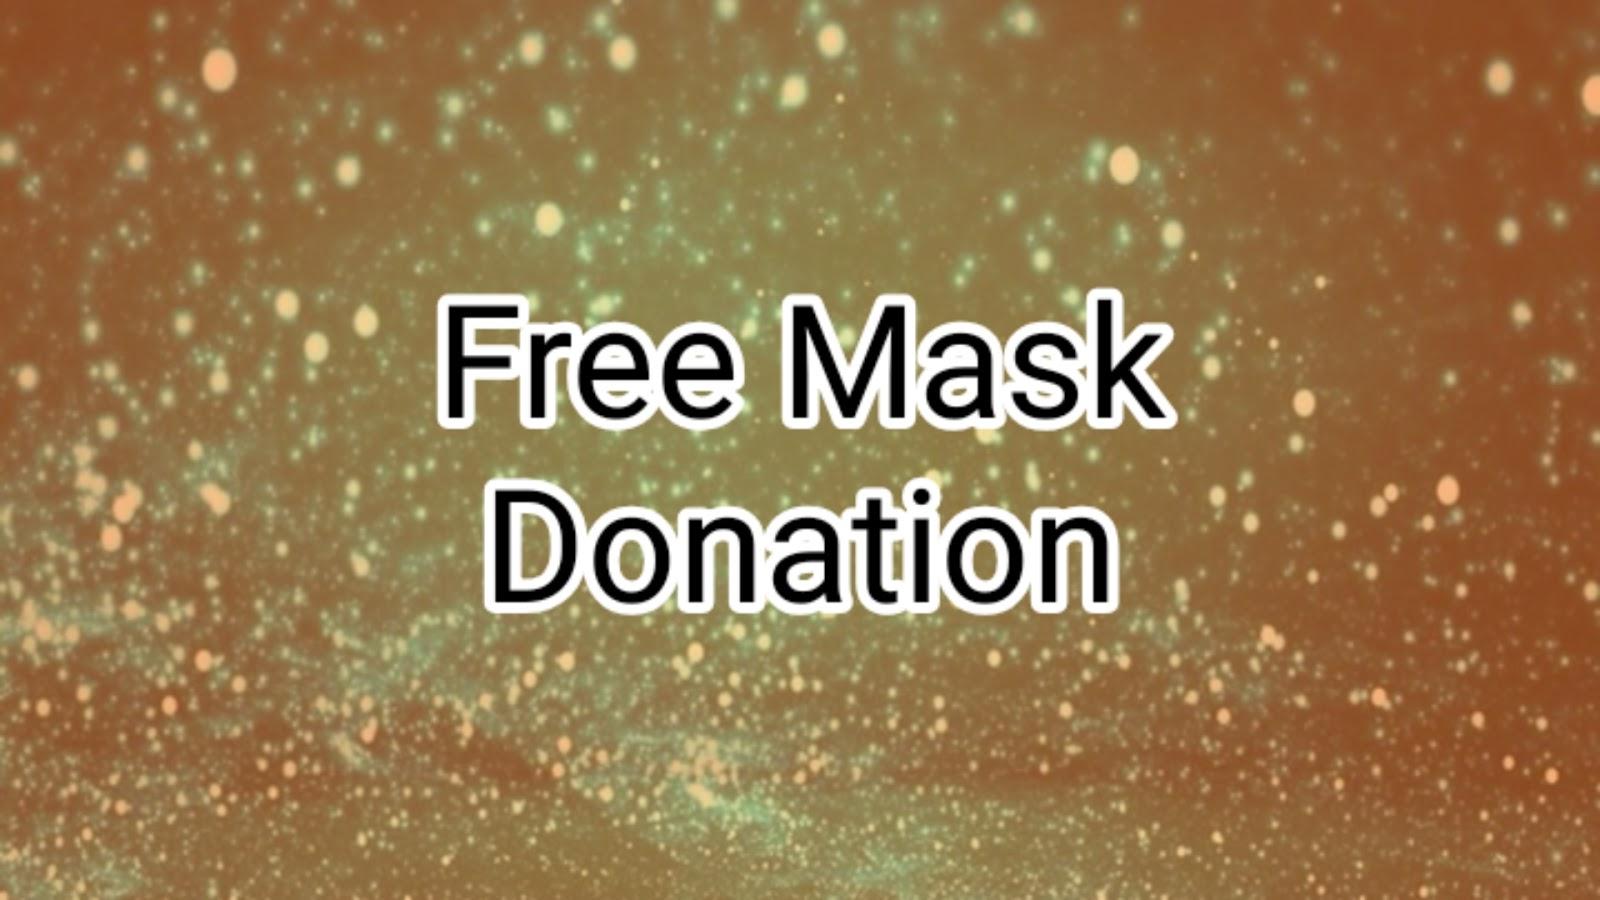 Perusahaan Teknologi China Beri Masker Gratis